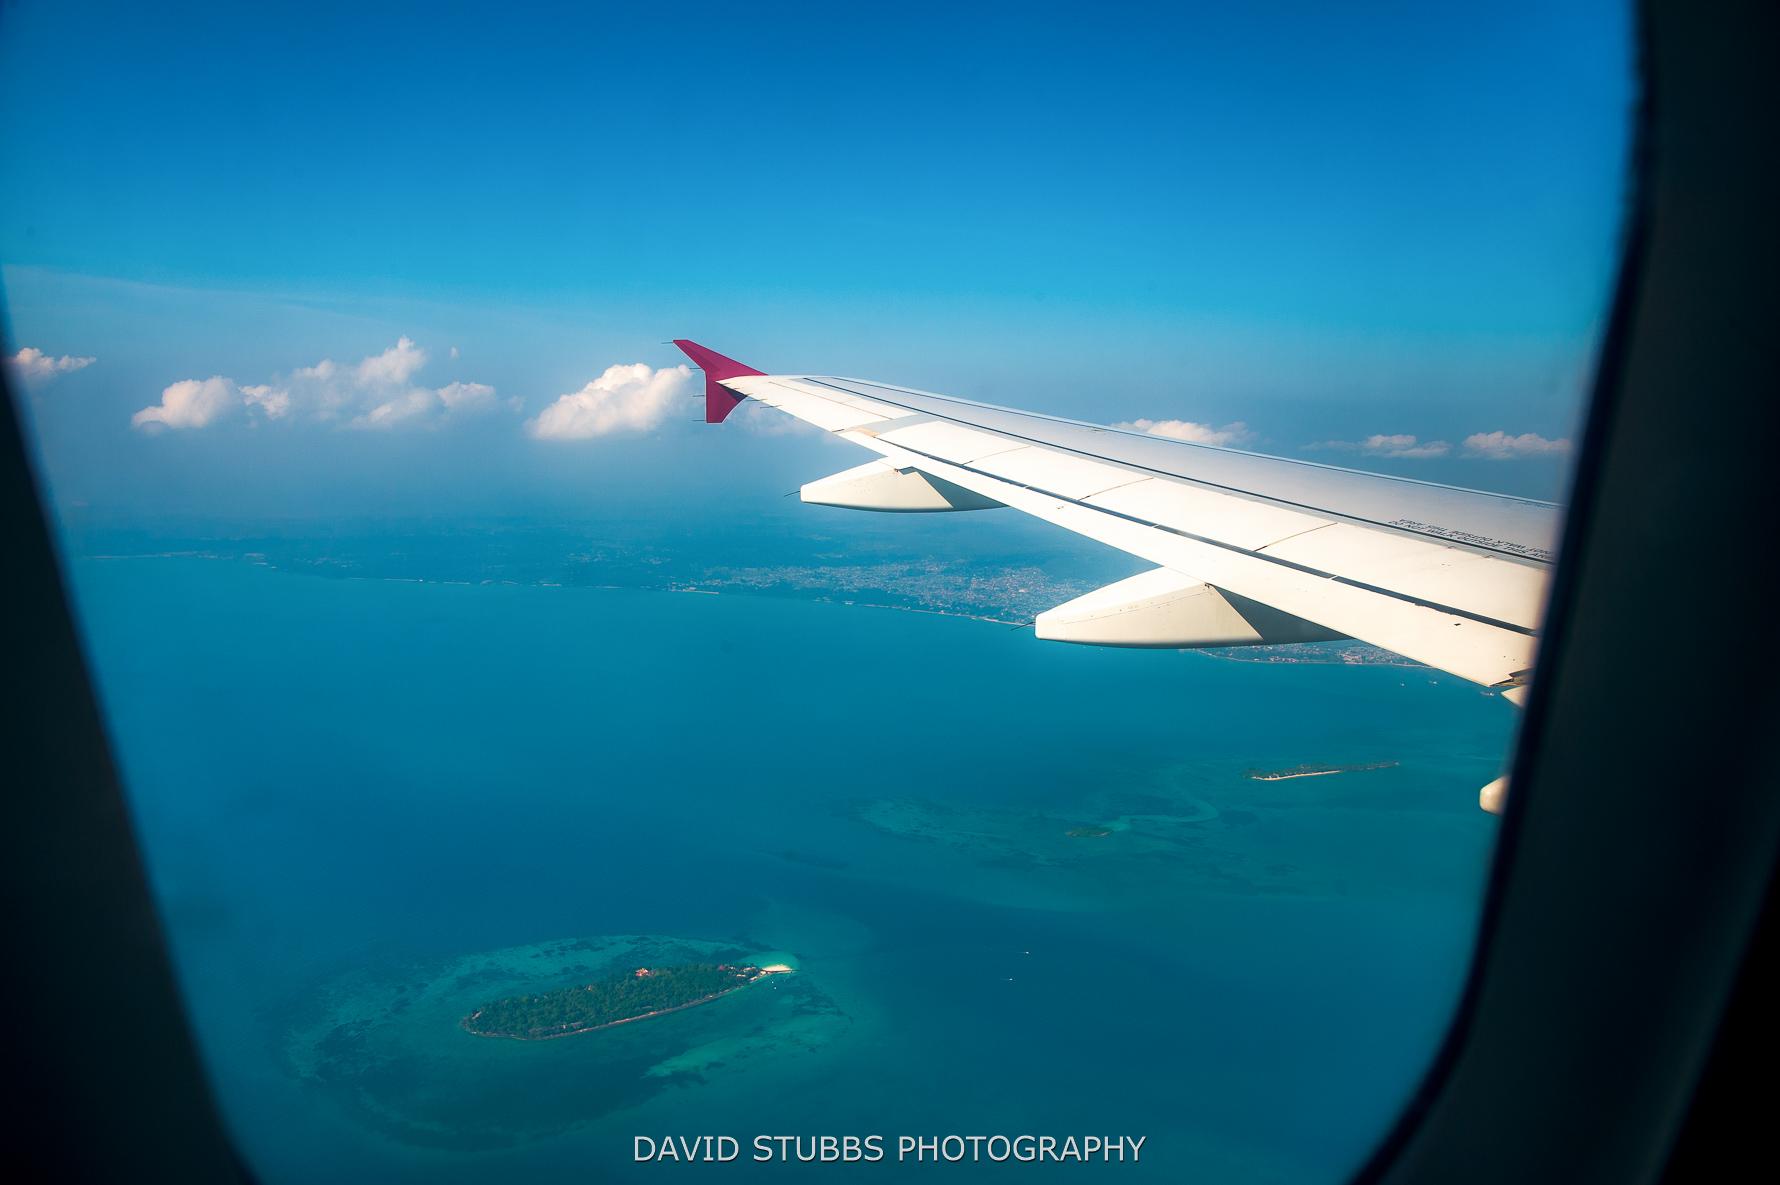 zanzibar from plane